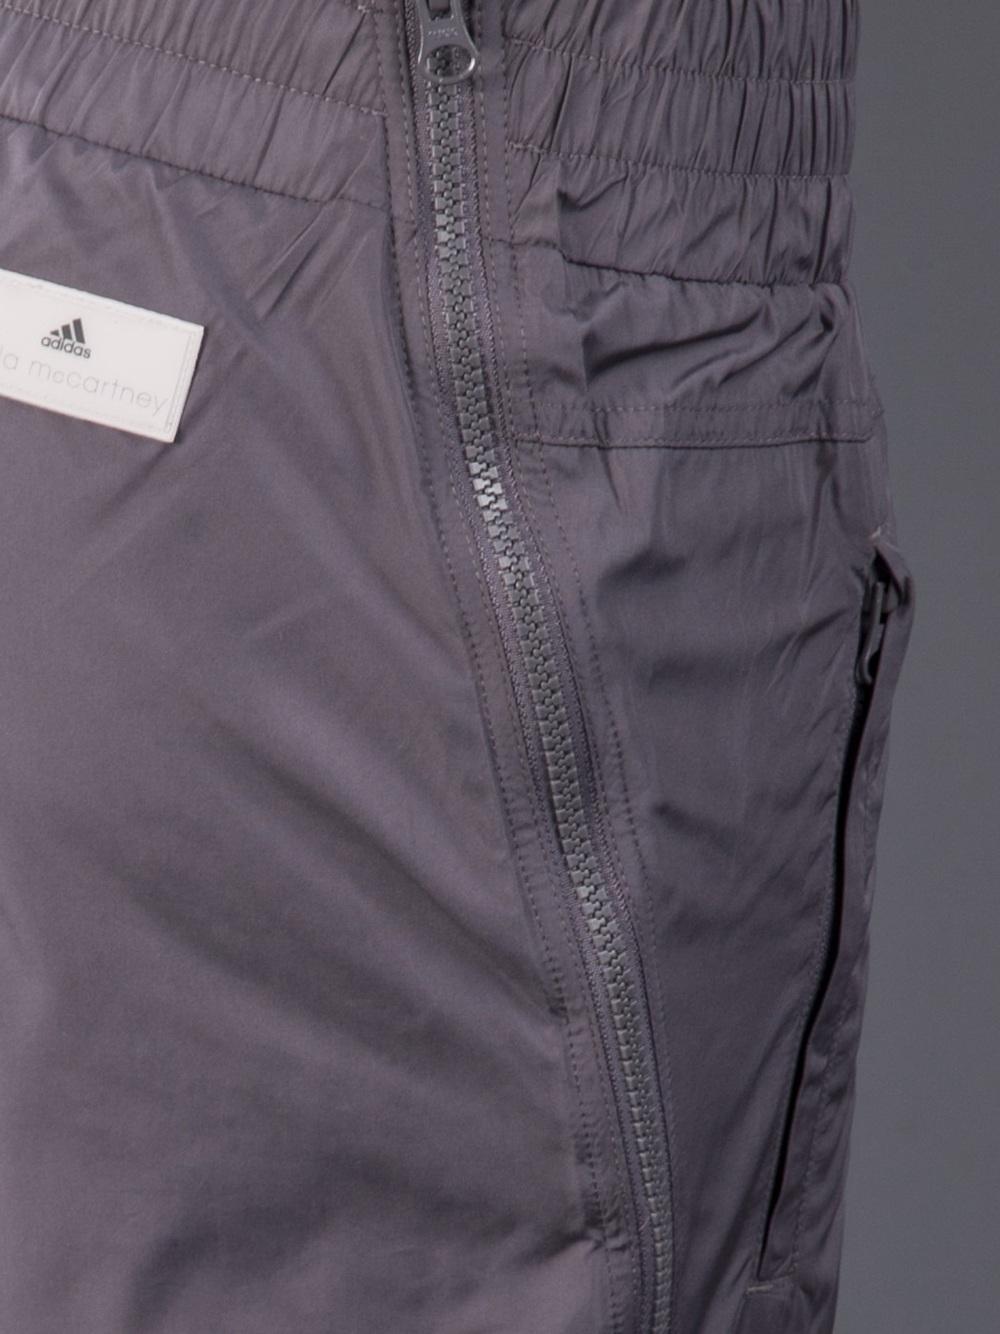 Adidas Stella McCartney Pants Studio Woven in Charcoal Gray Pocket View